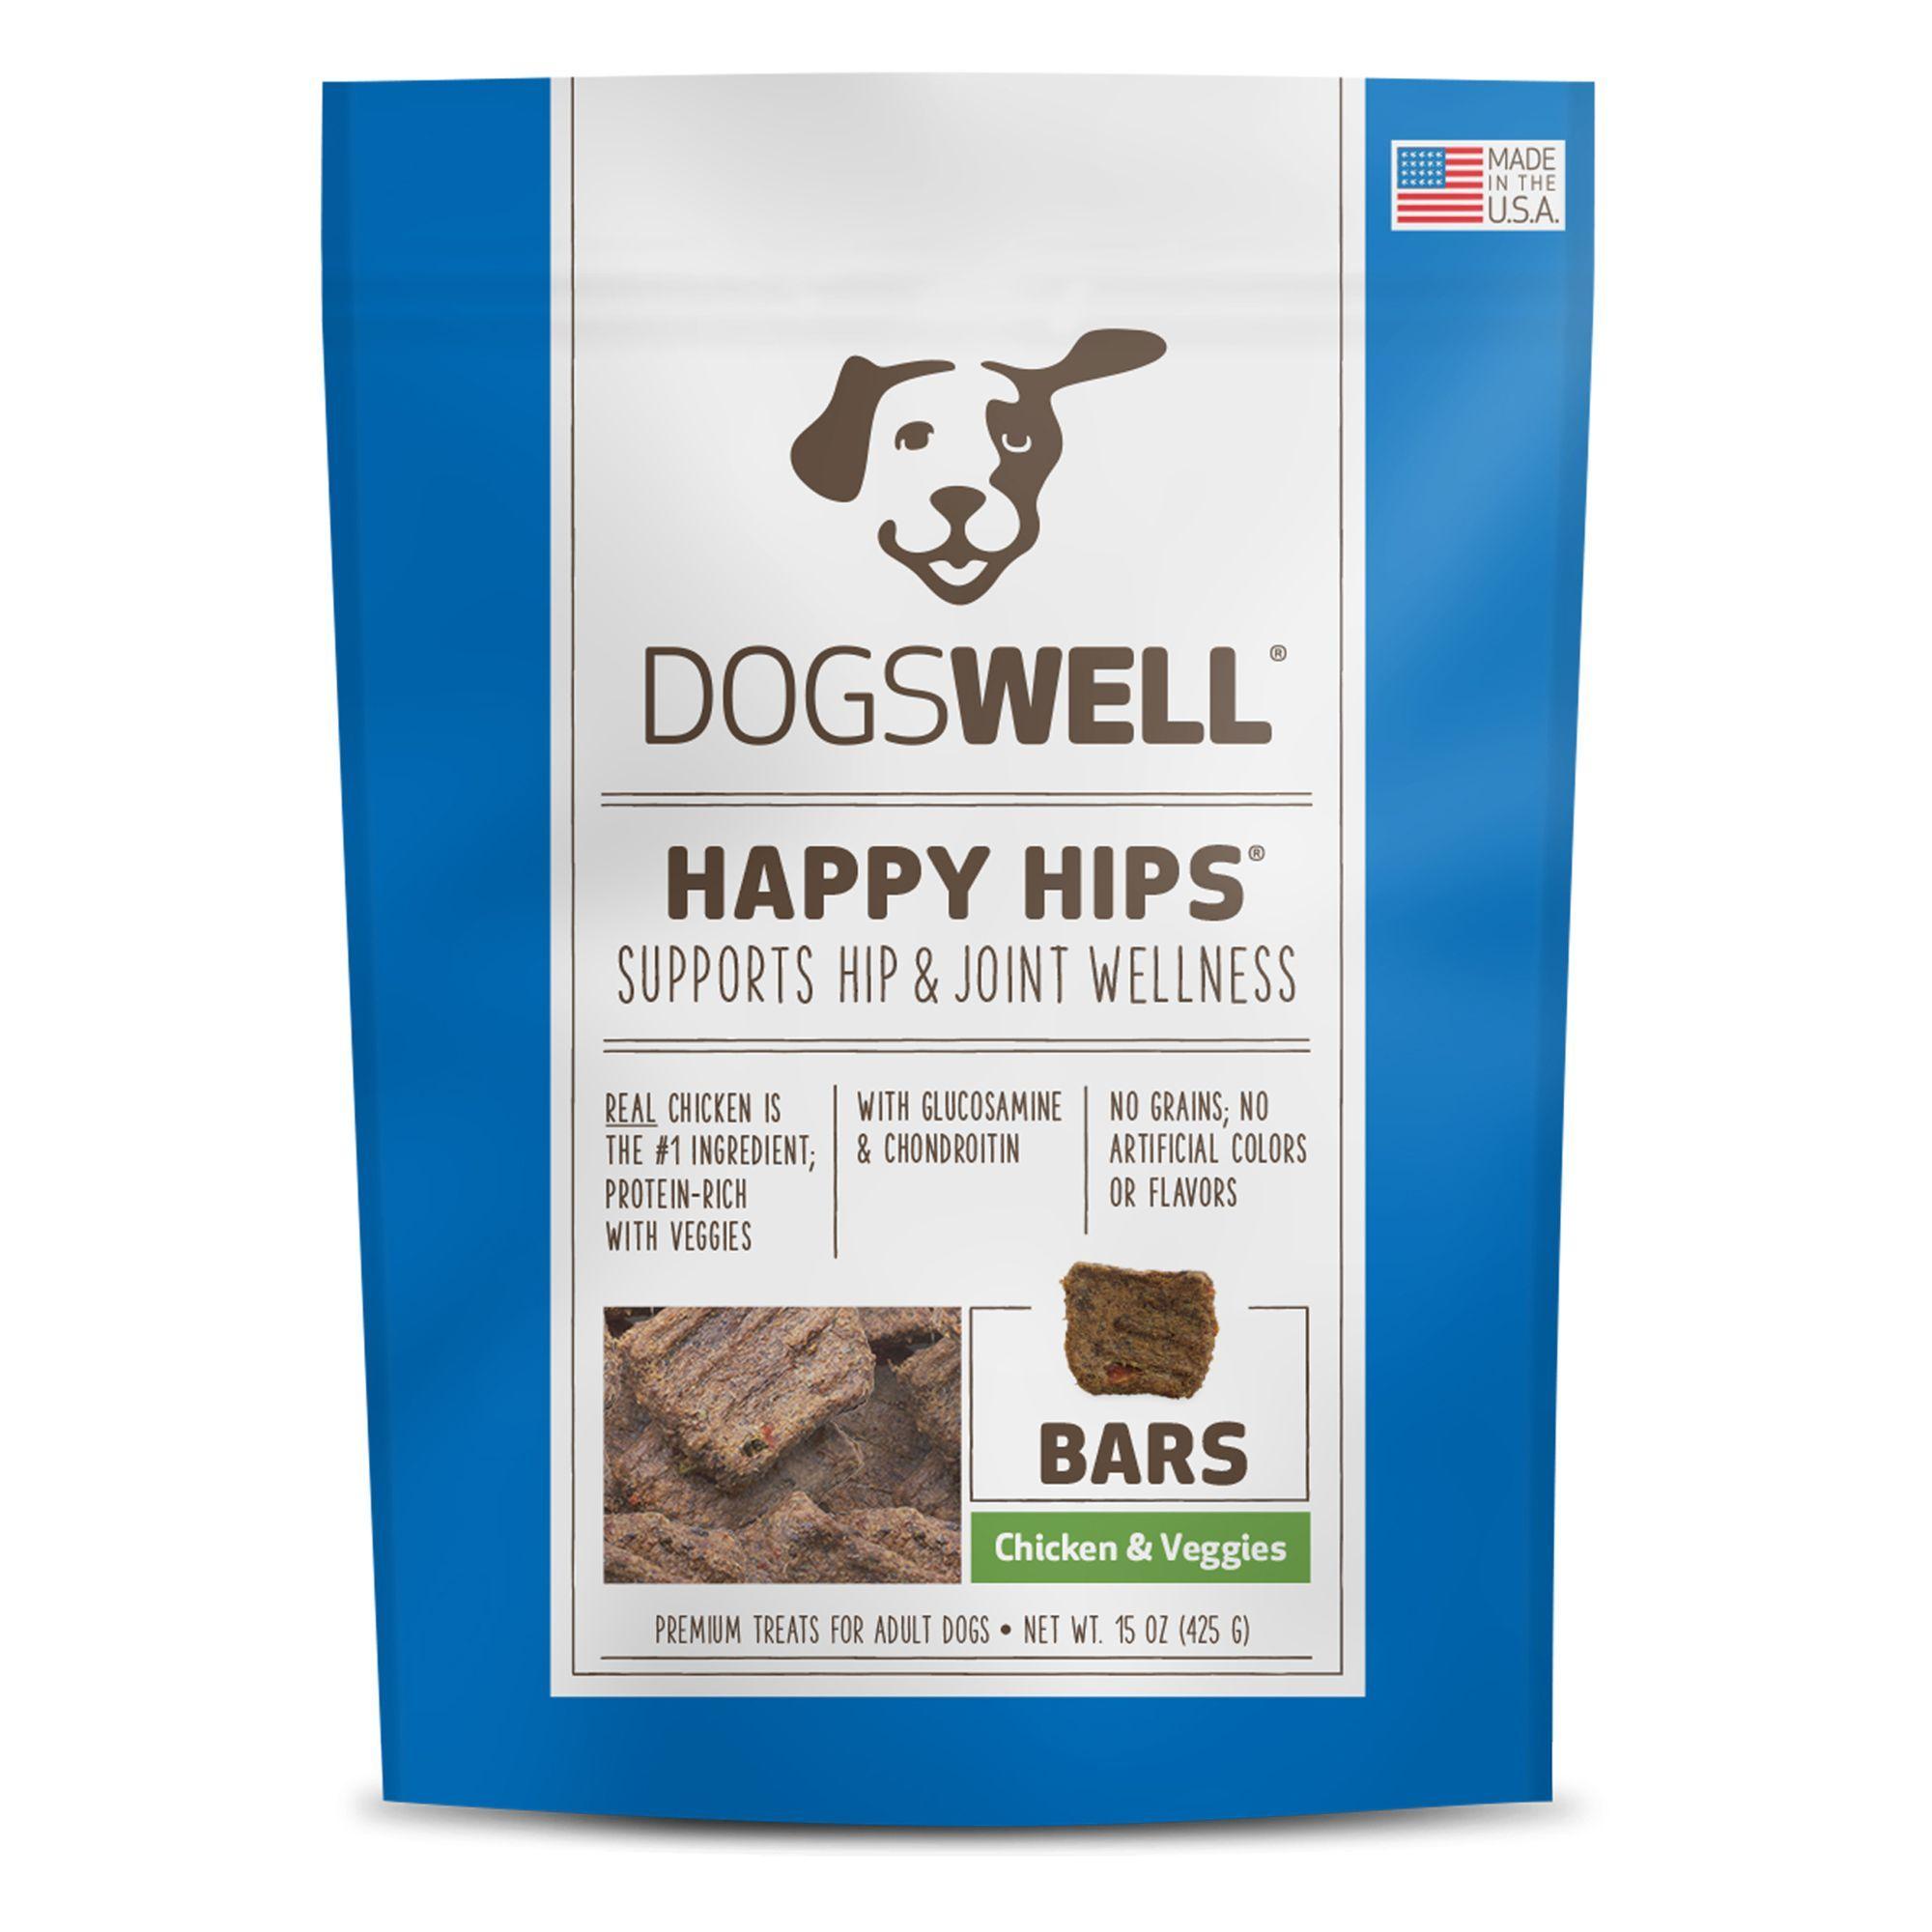 Dogswell Happy Hips Bars Dog Treat Grain Free Chicken And Veggies Size 15 Oz Jerky Bar Treat Adult Jerky Treats Chicken Flavors Dog Treats Grain Free